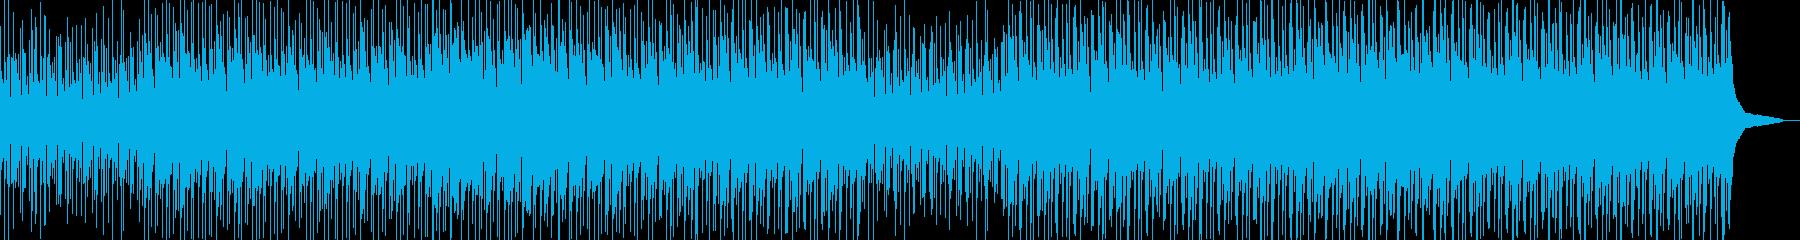 Happy Ukulele 9の再生済みの波形